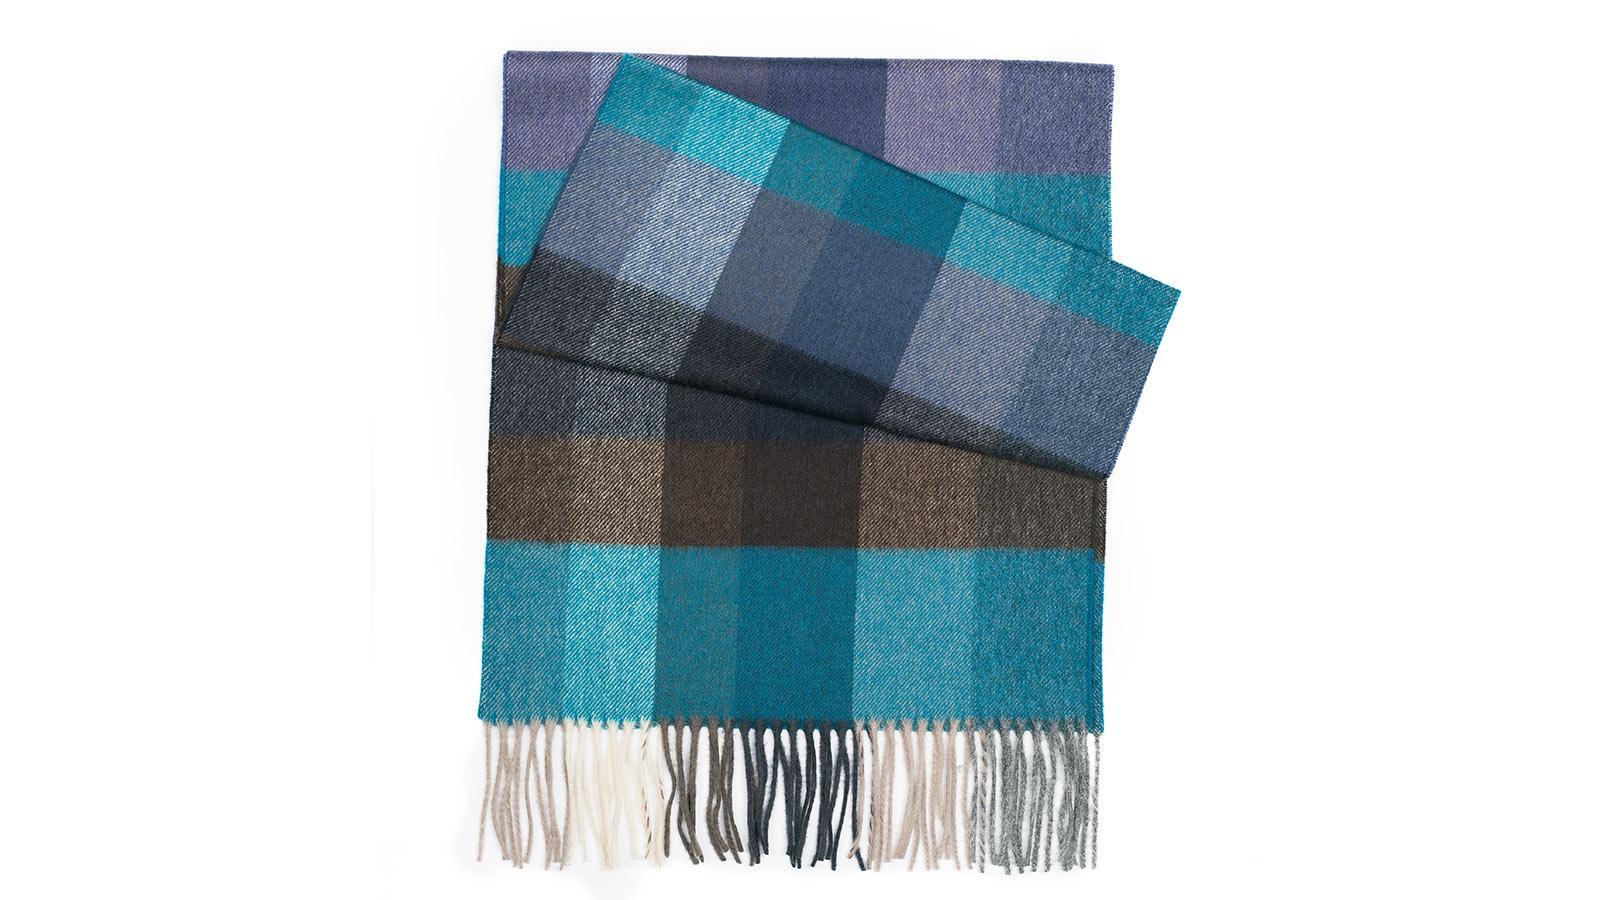 Blue & Green Check Wool Scarf - slider image 1